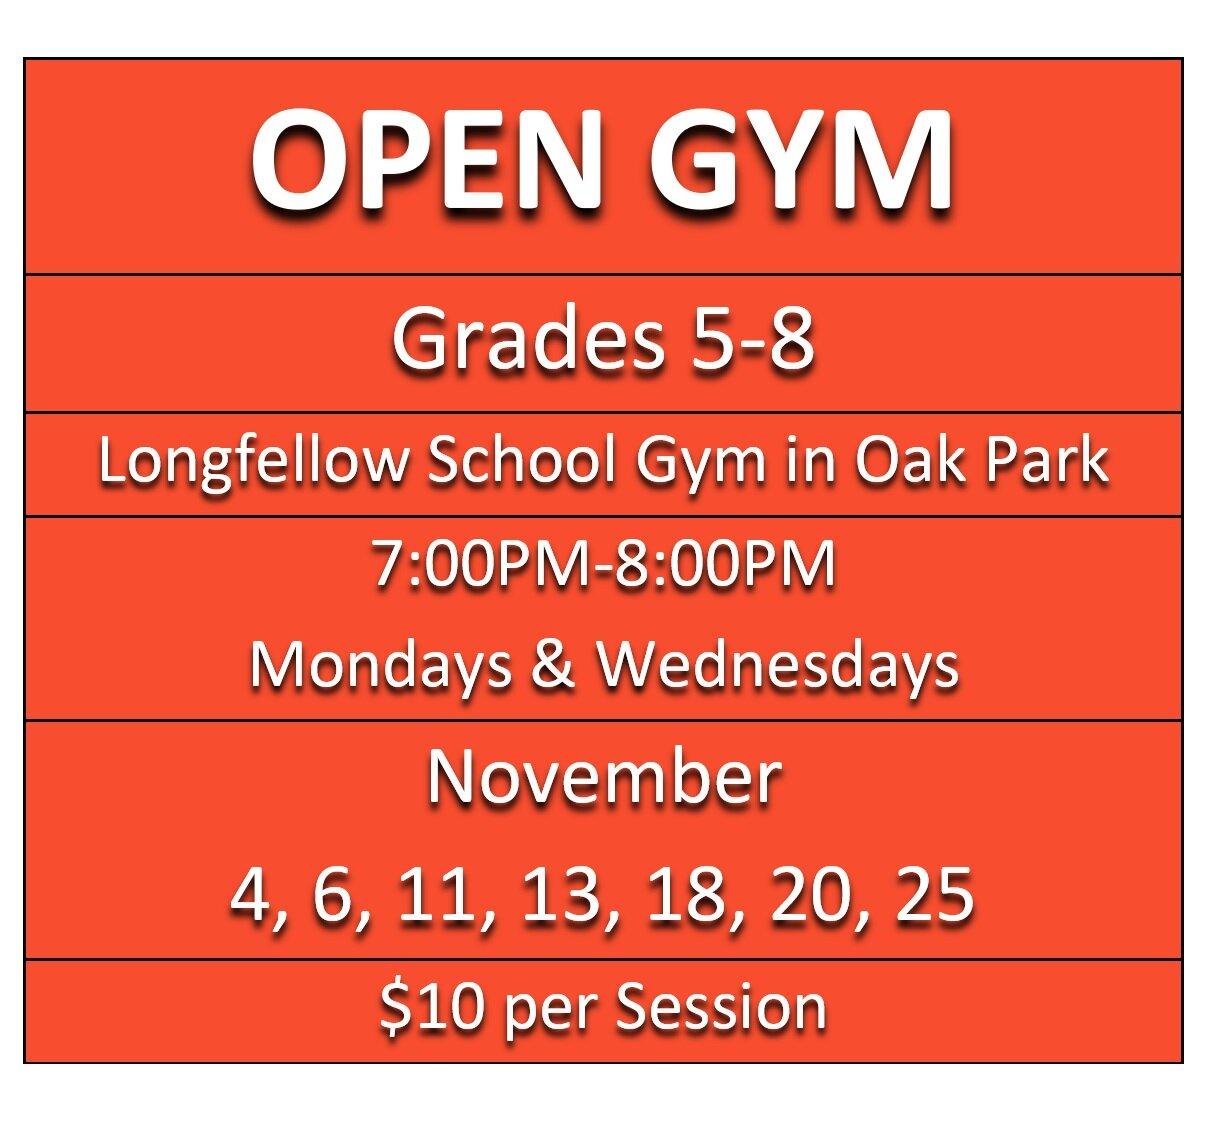 open gym details nov 2019.jpg